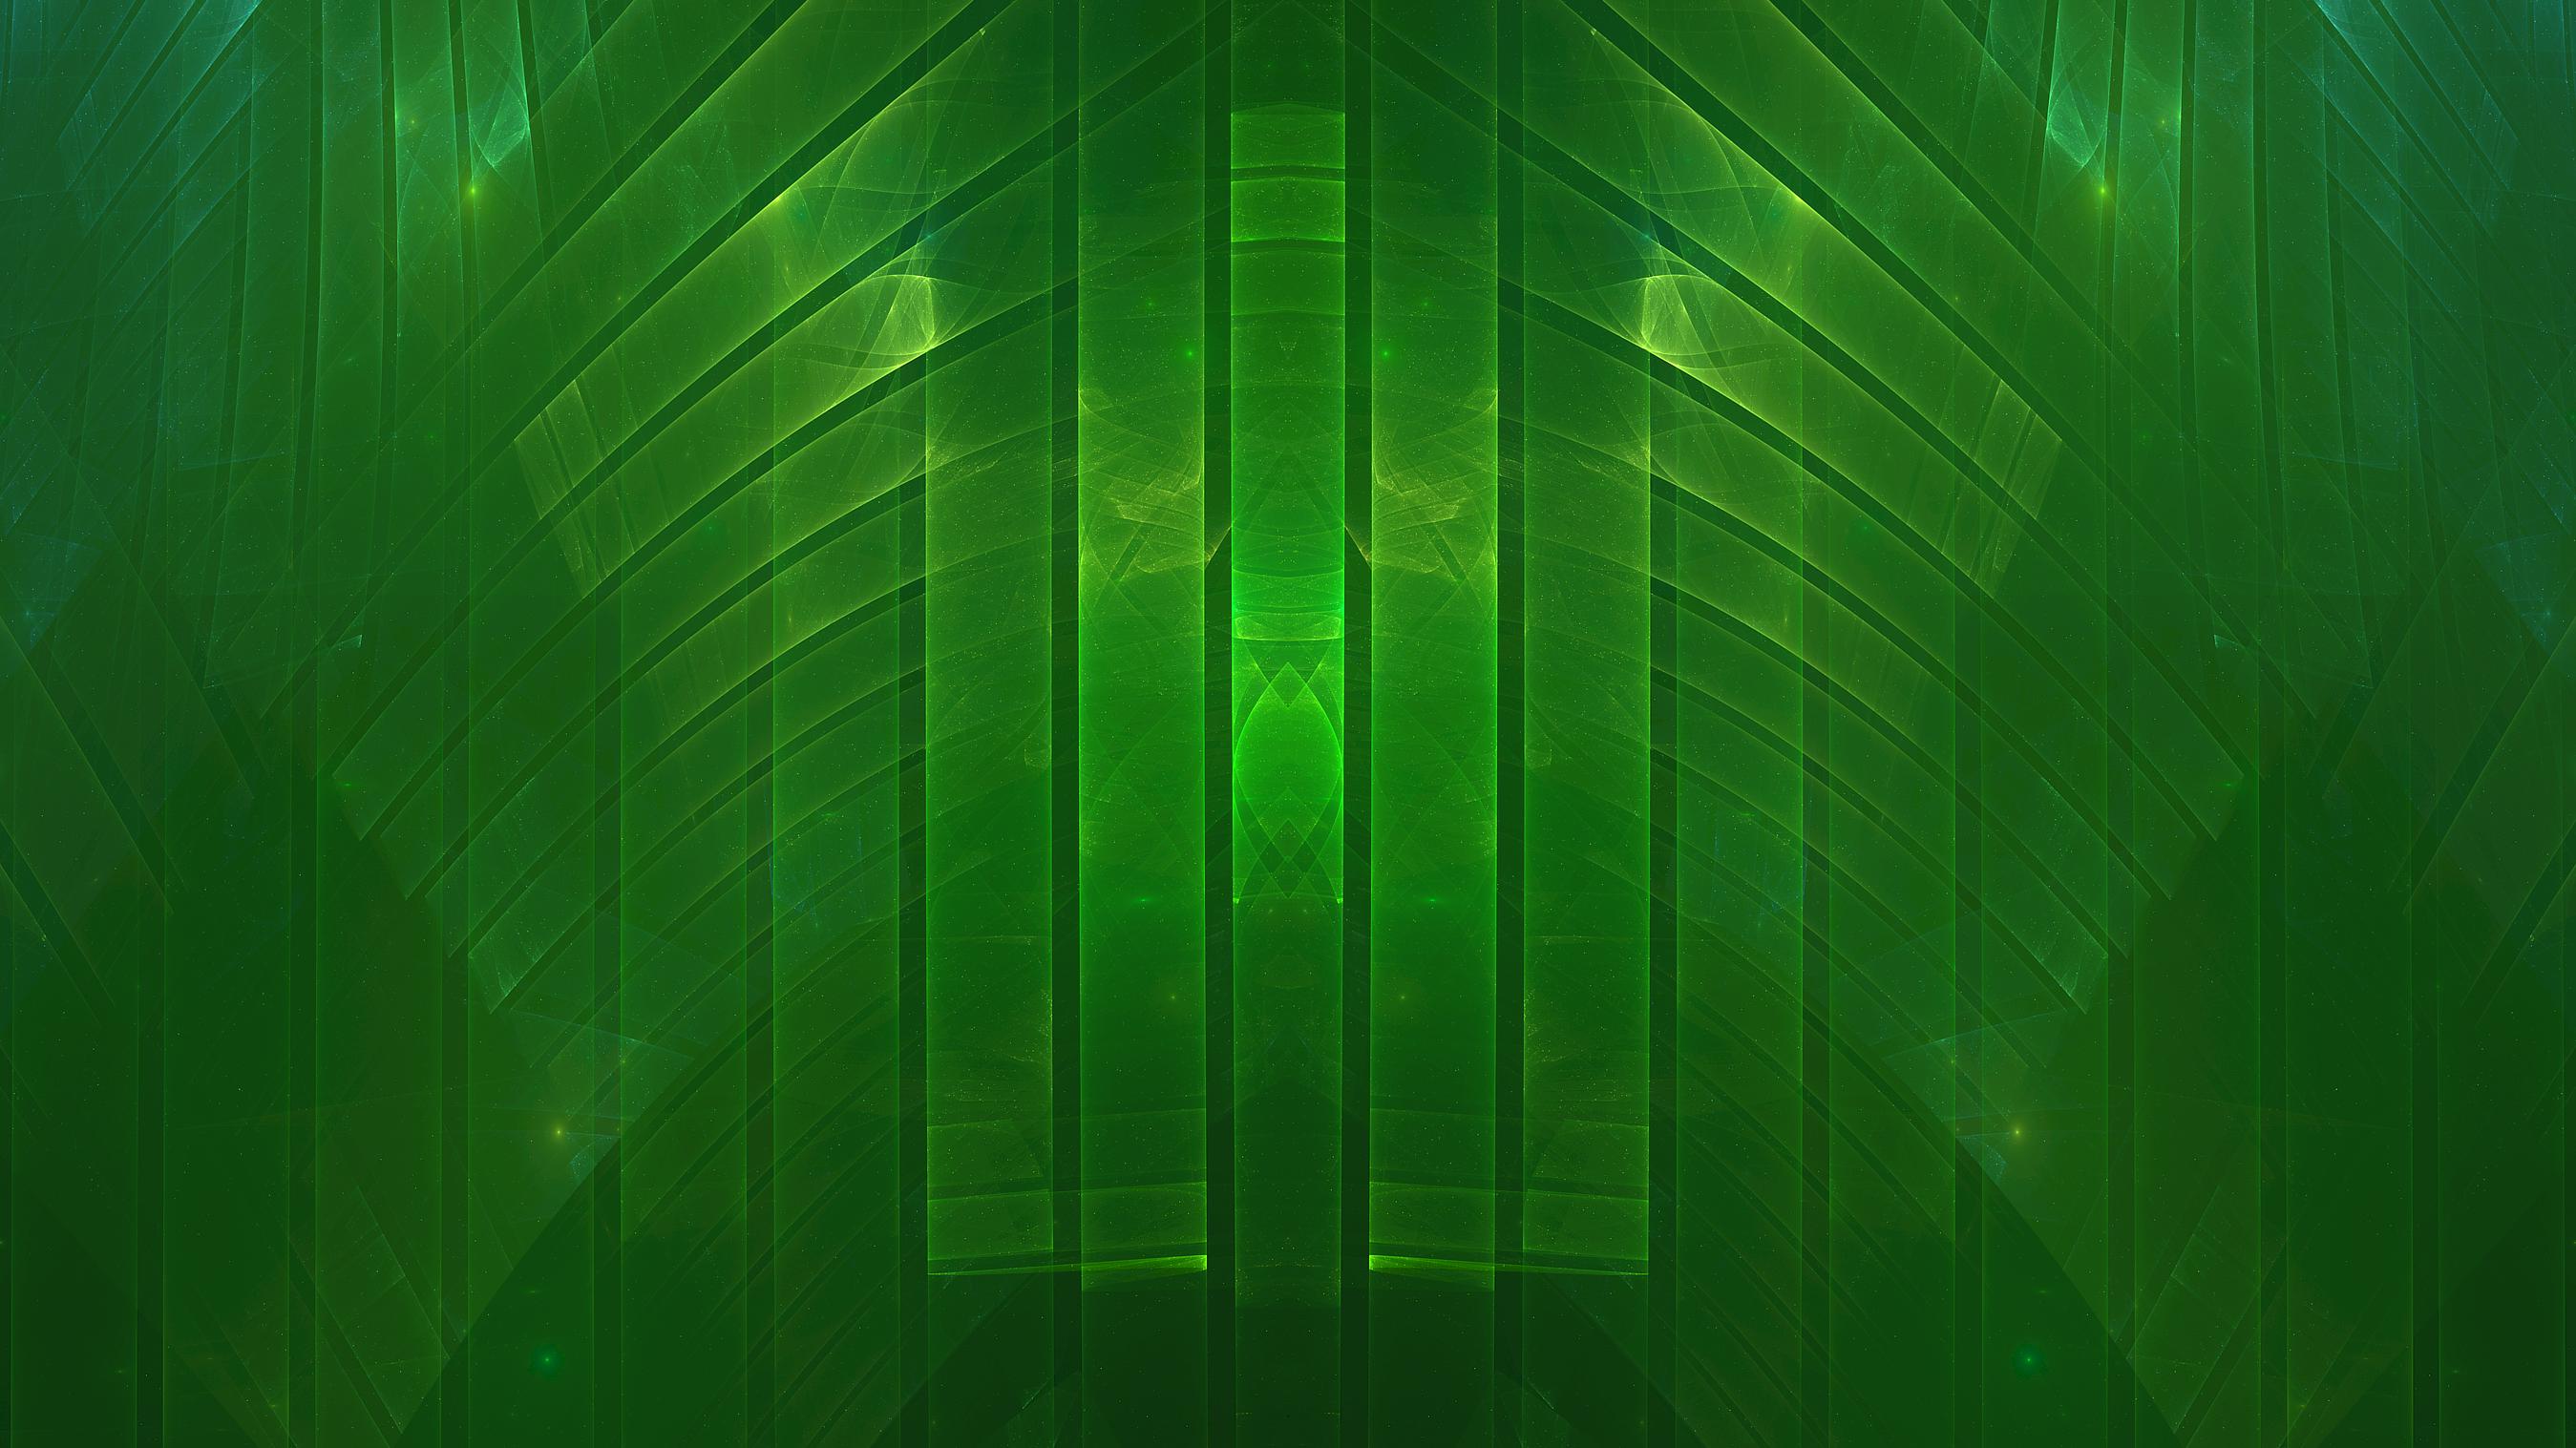 General 2698x1517 abstract fractal symmetry digital art green